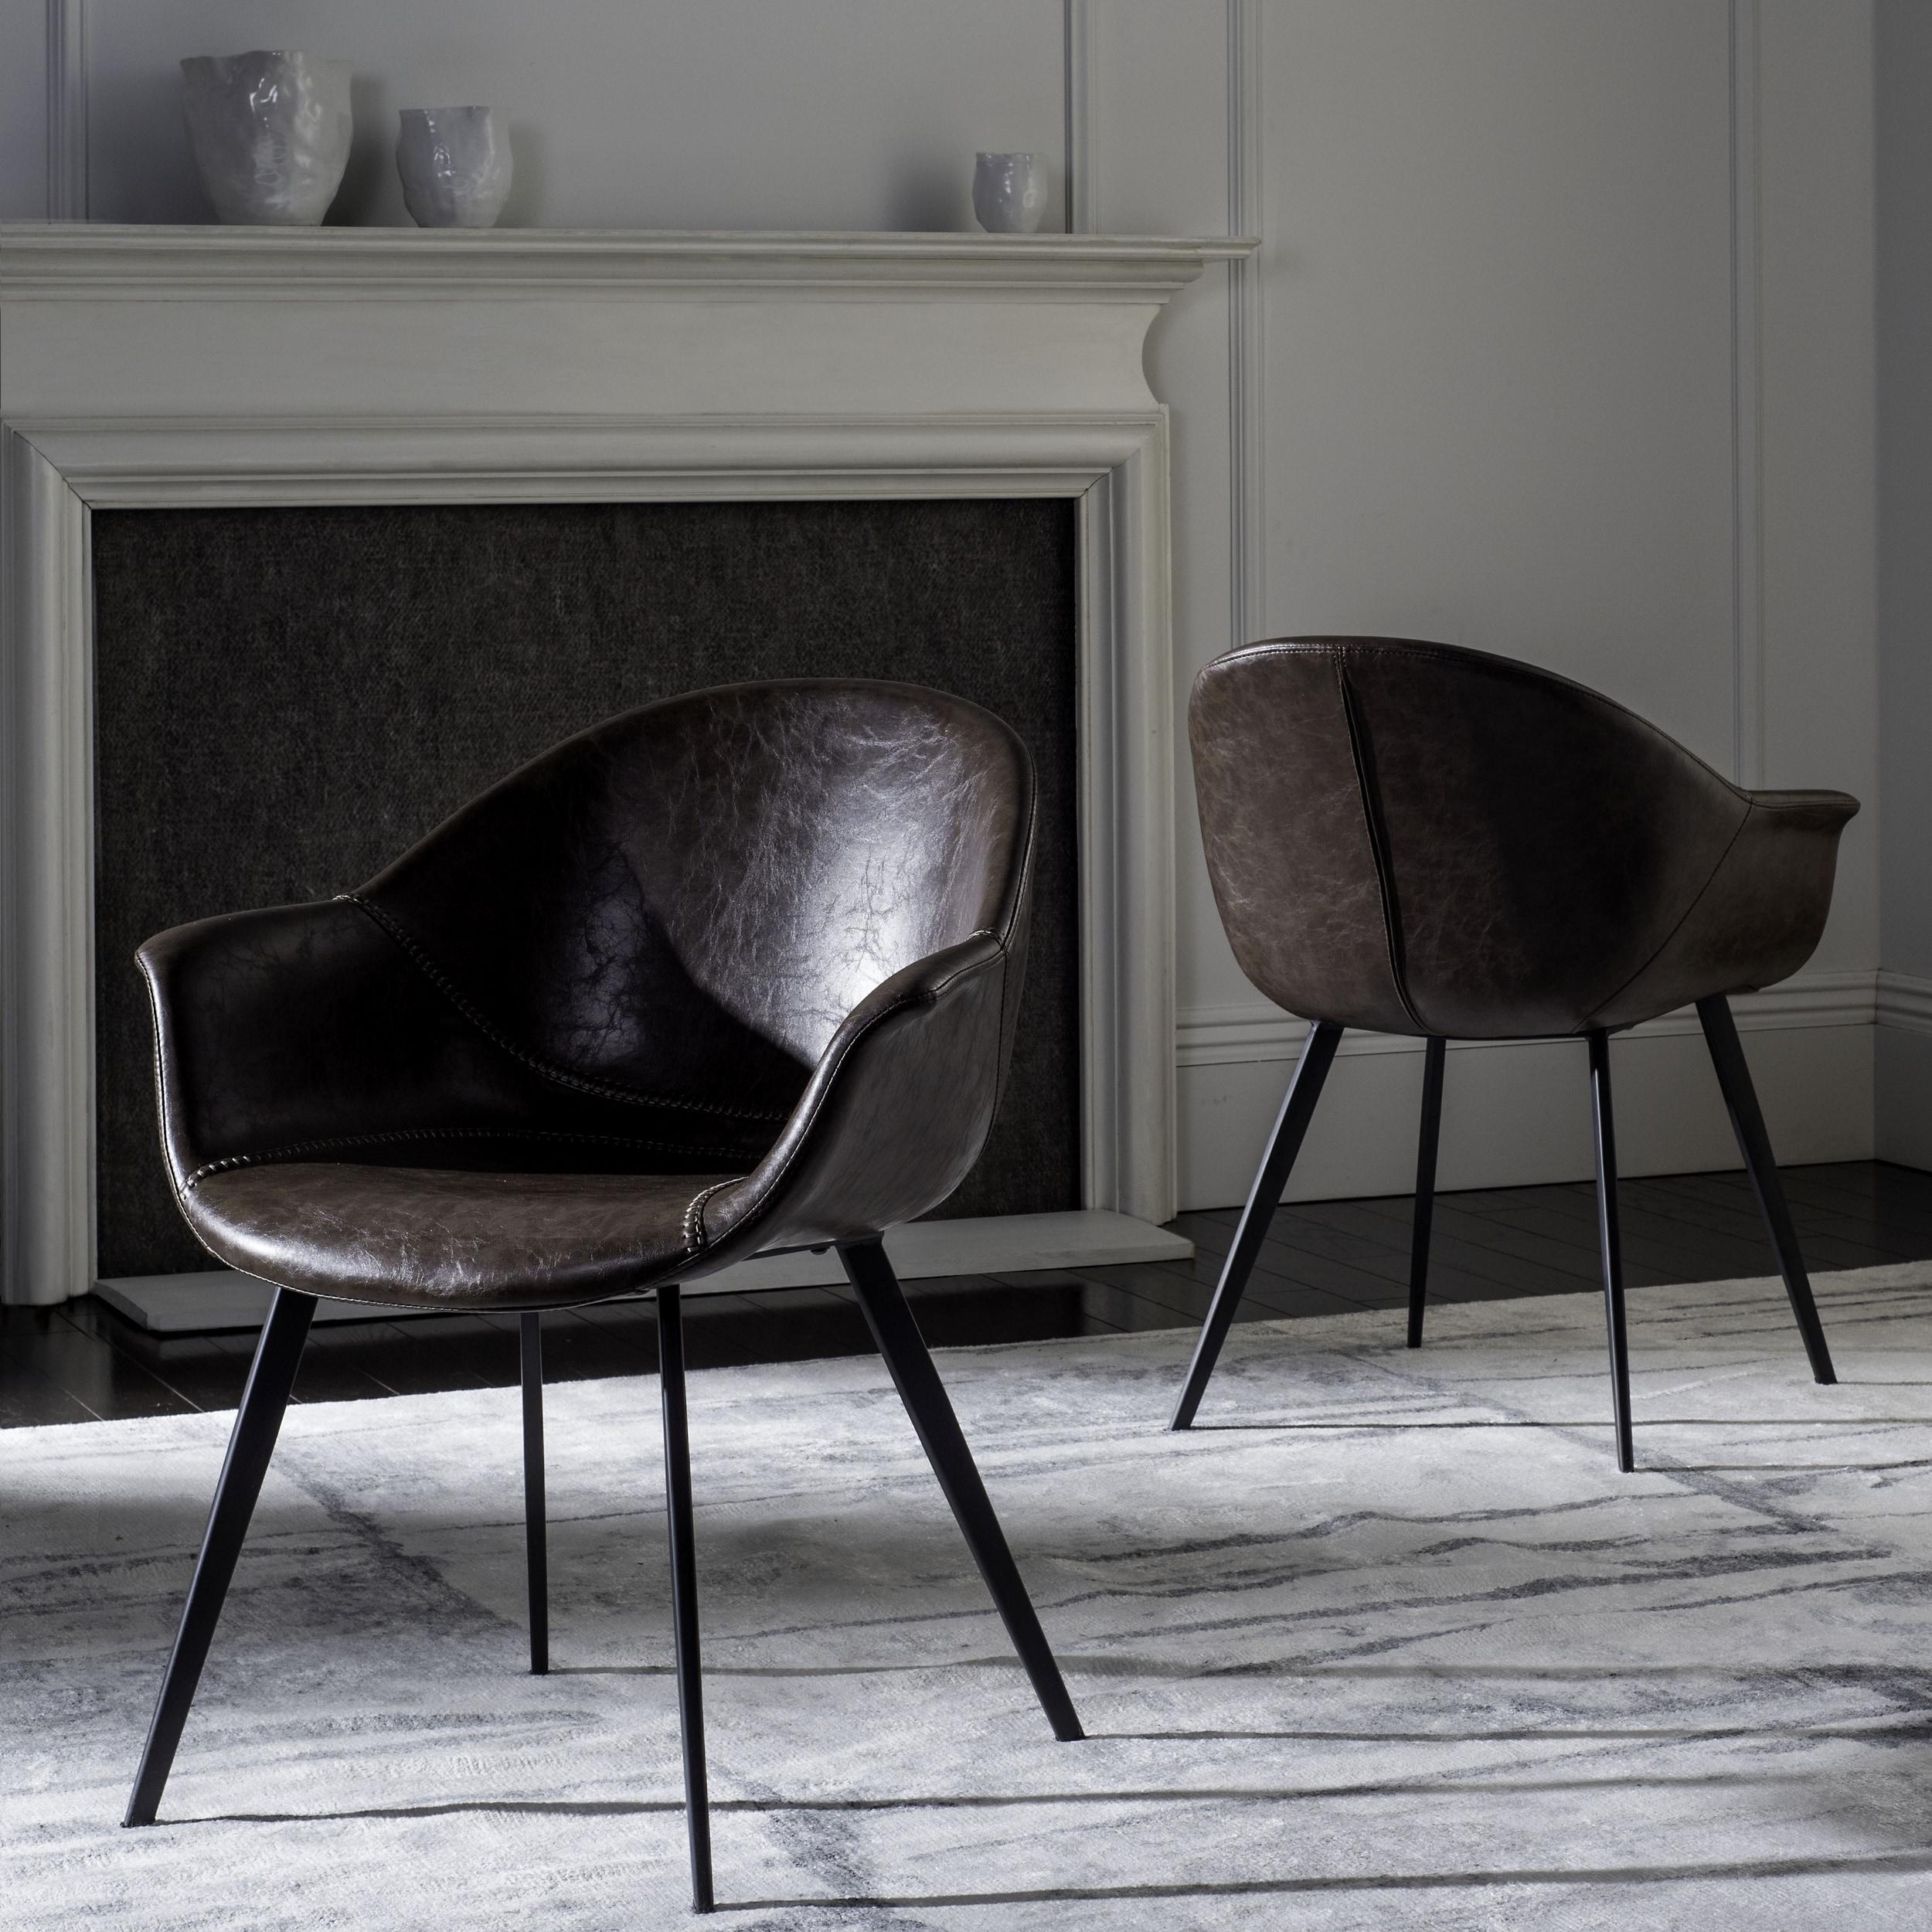 9f3d6dac8c03c Safavieh Dublin Mid-Century Modern Leather Dining Tub Chairdark Brown   Black Dining Chair (Set of 2)